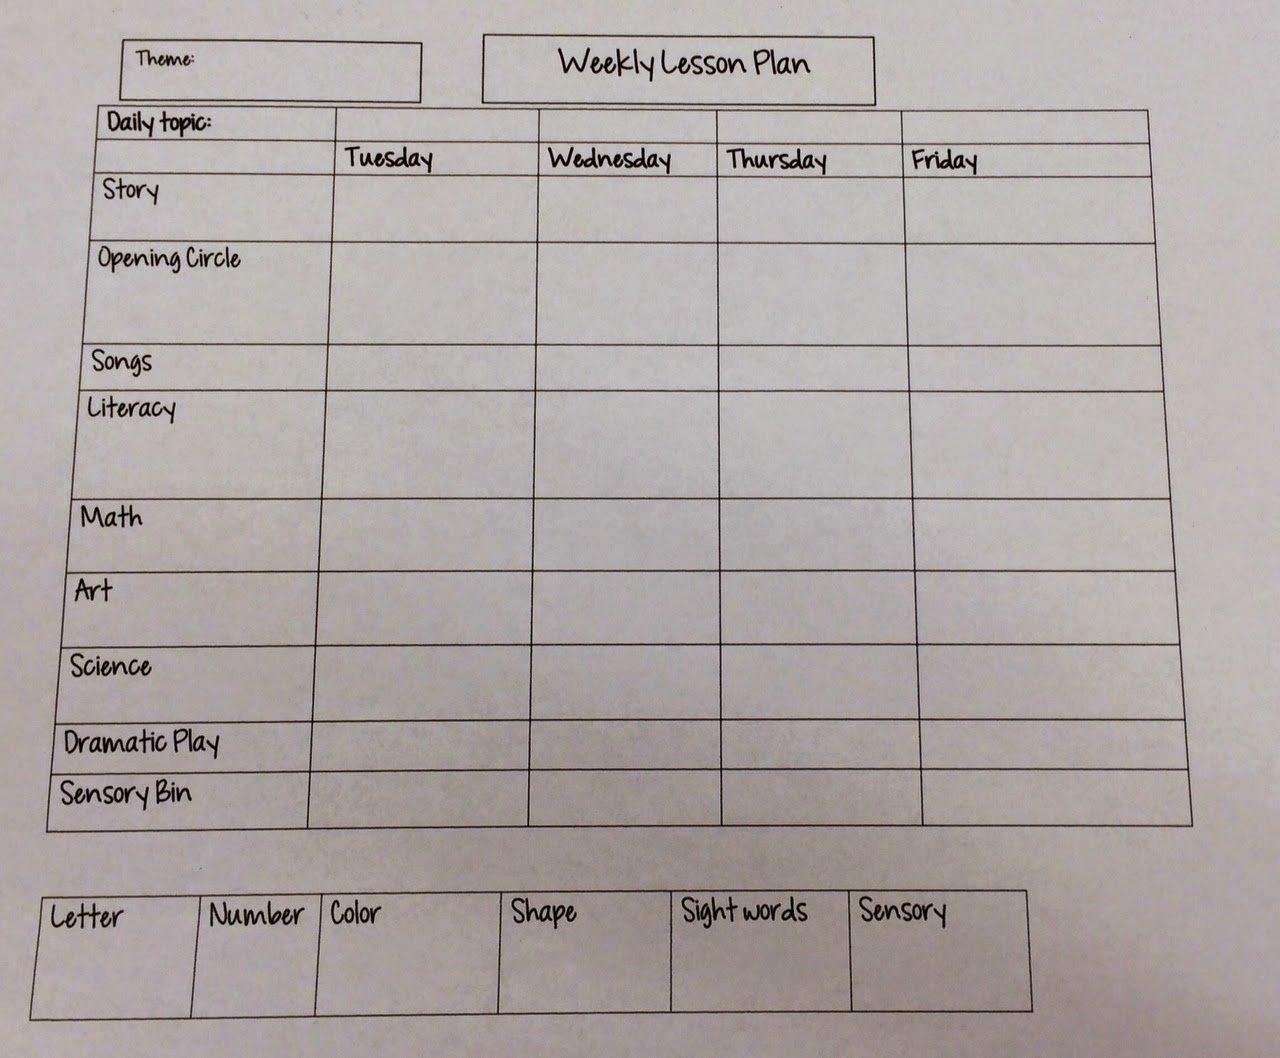 Preschool Lesson Plan Template Beautiful Miss Nicole S Preschool Weekly Lesson Plan Template